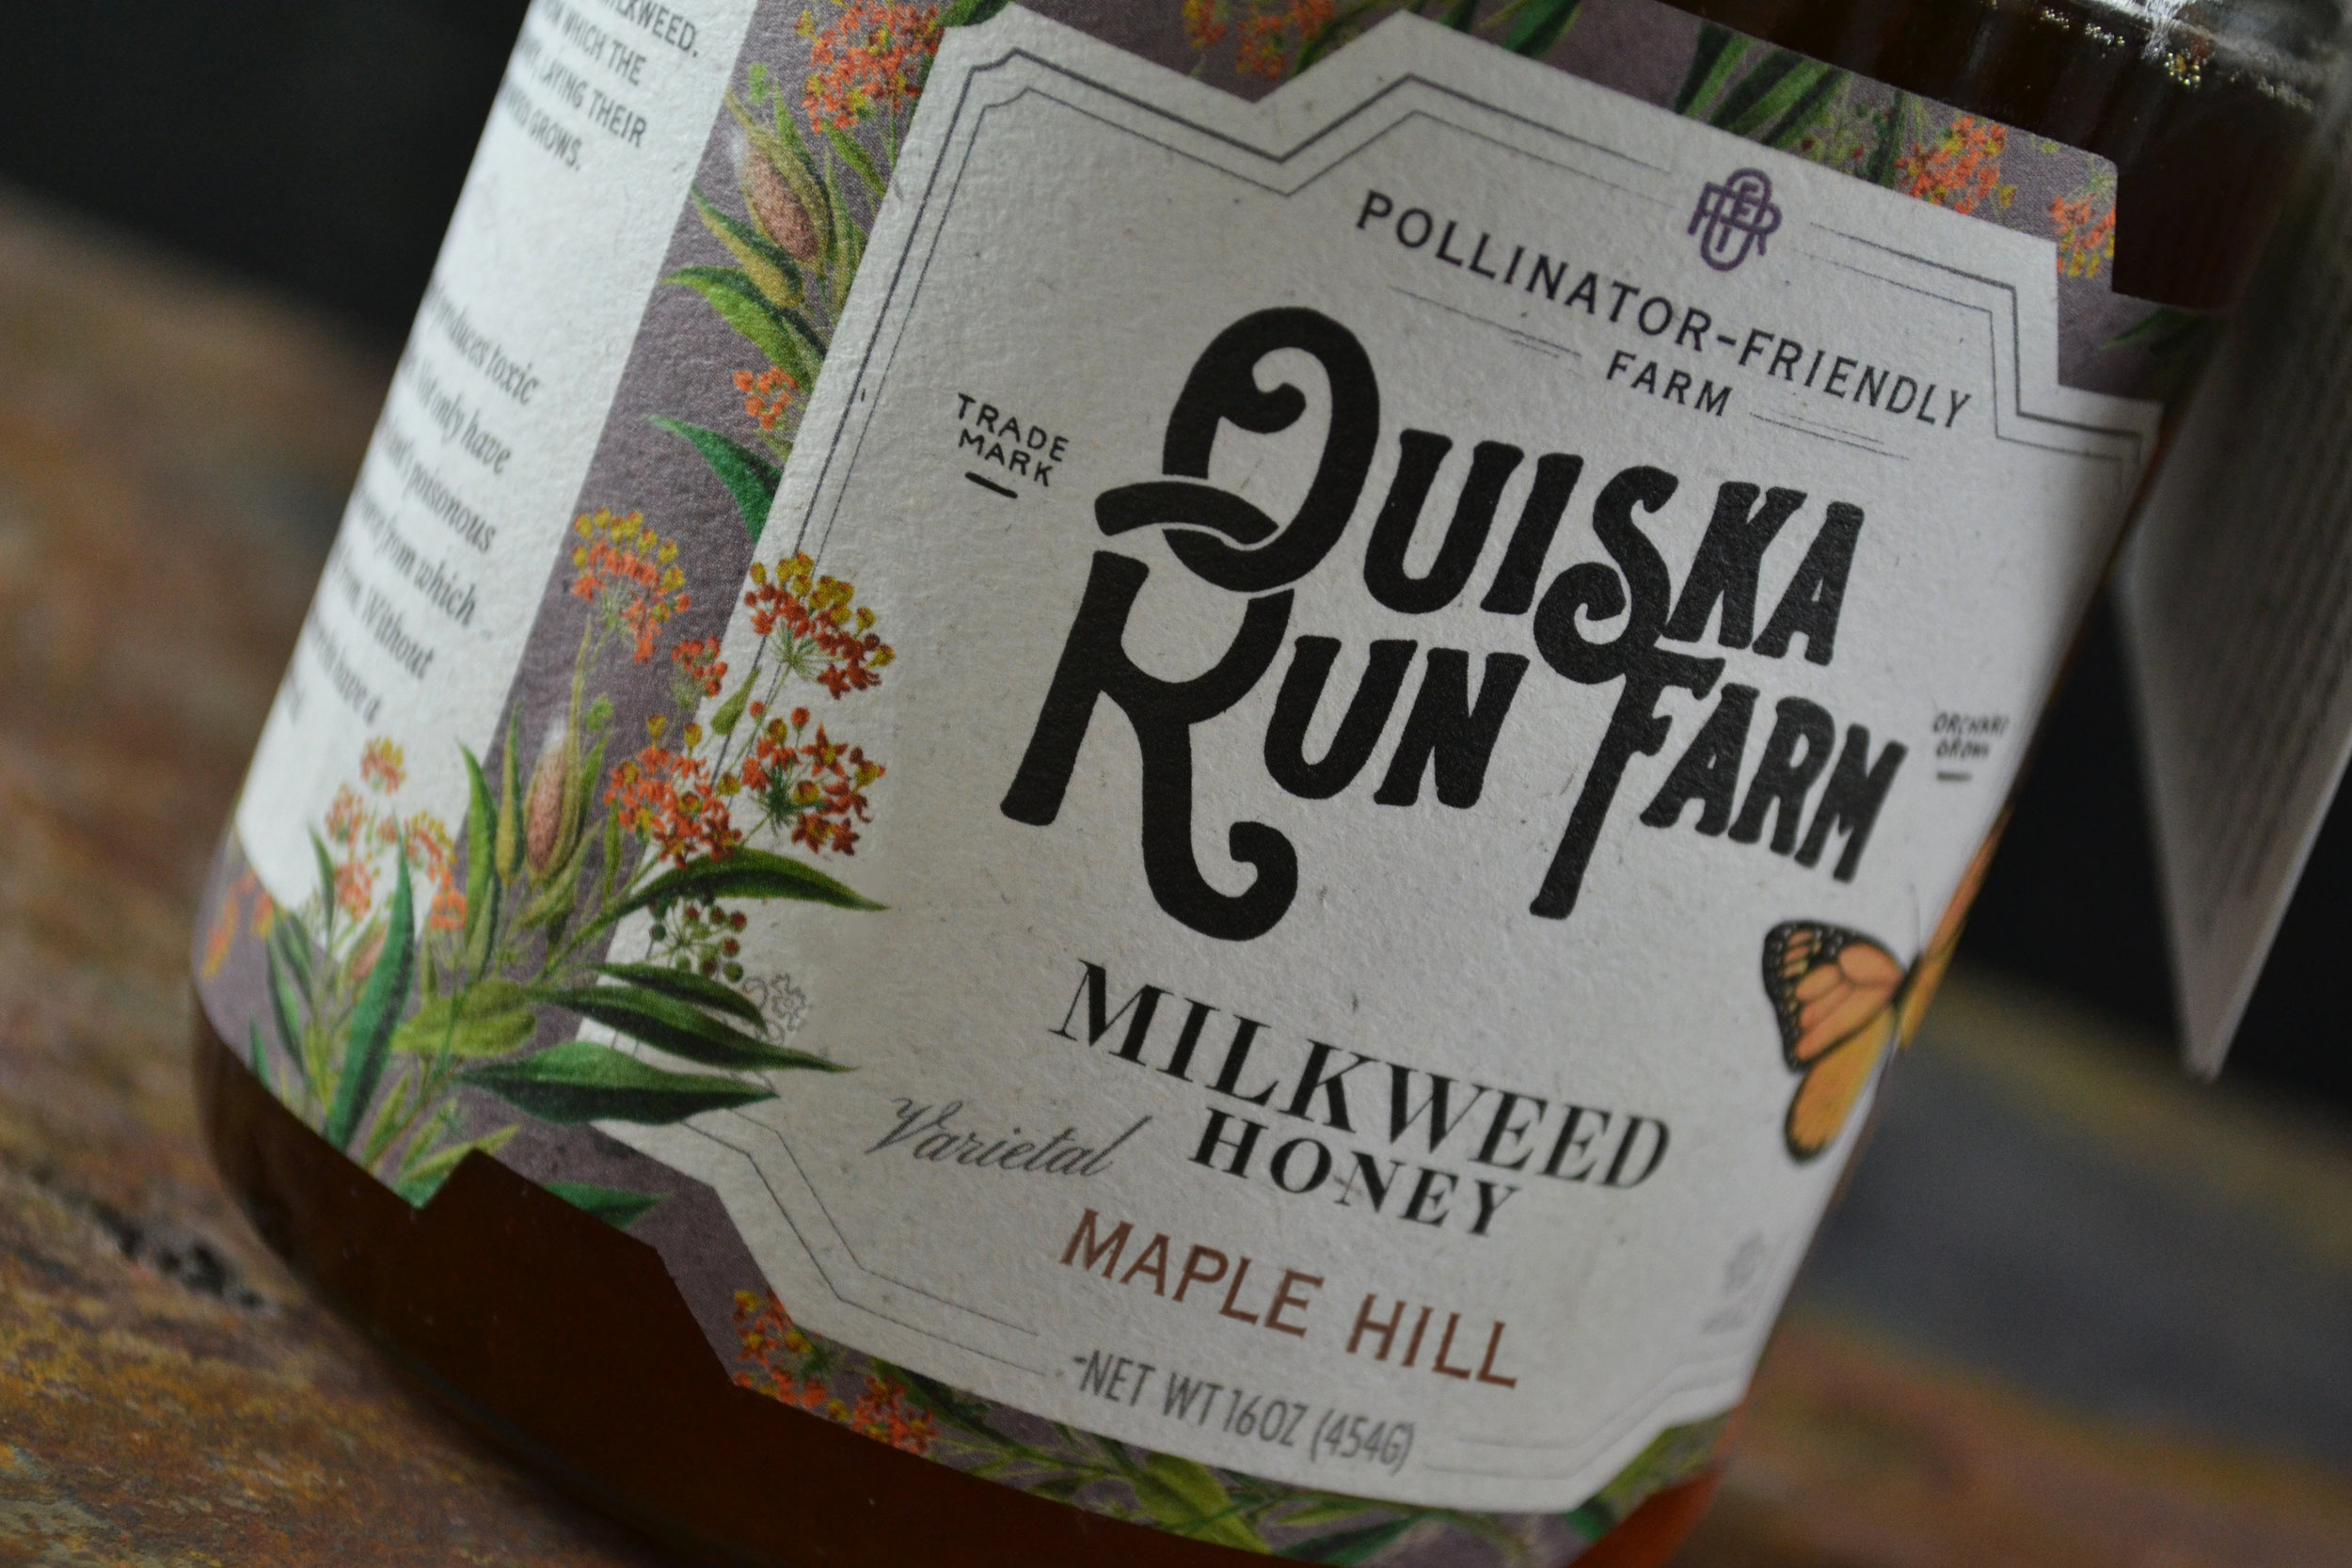 Ouiska Run Farm Honey Package Design